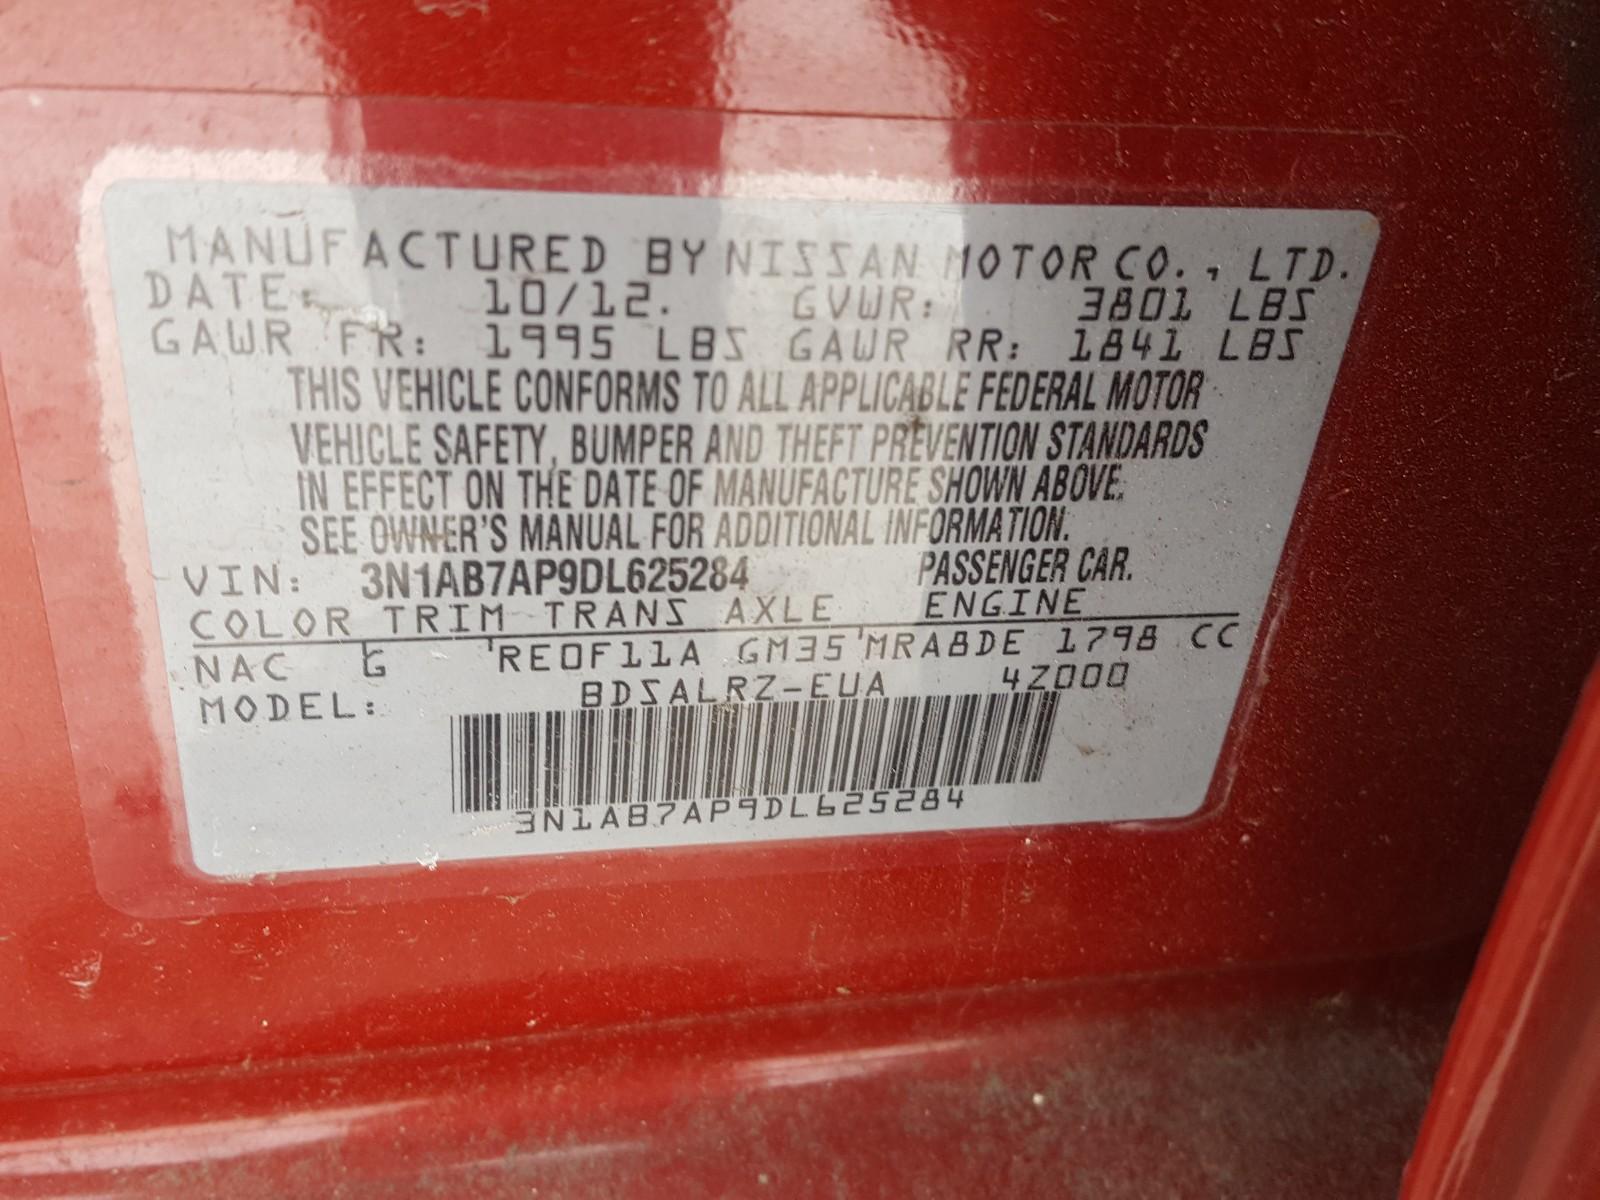 3N1AB7AP9DL625284 - 2013 Nissan Sentra S 1.8L